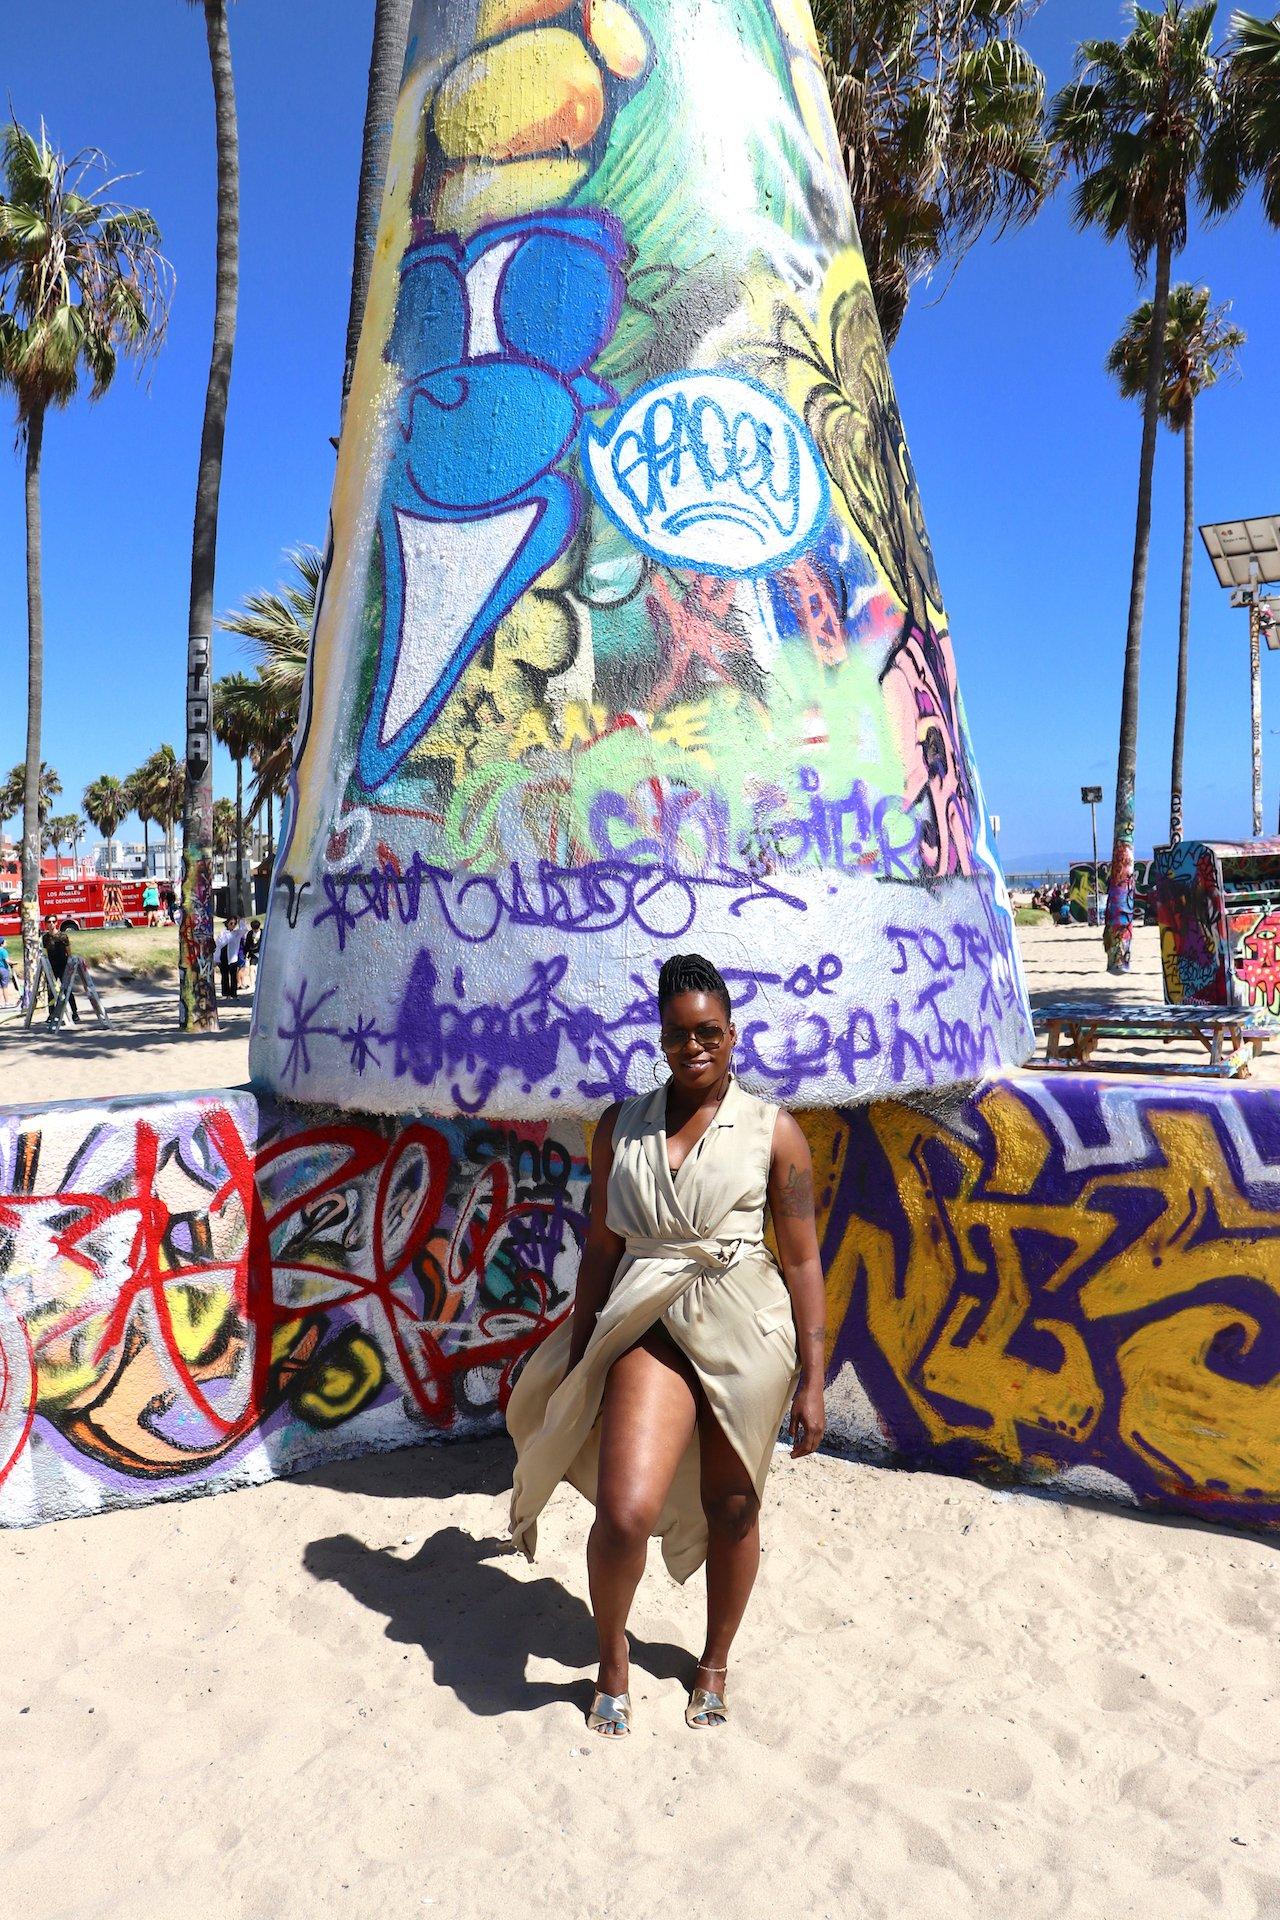 Day Trip to Venice Beach Art Walls